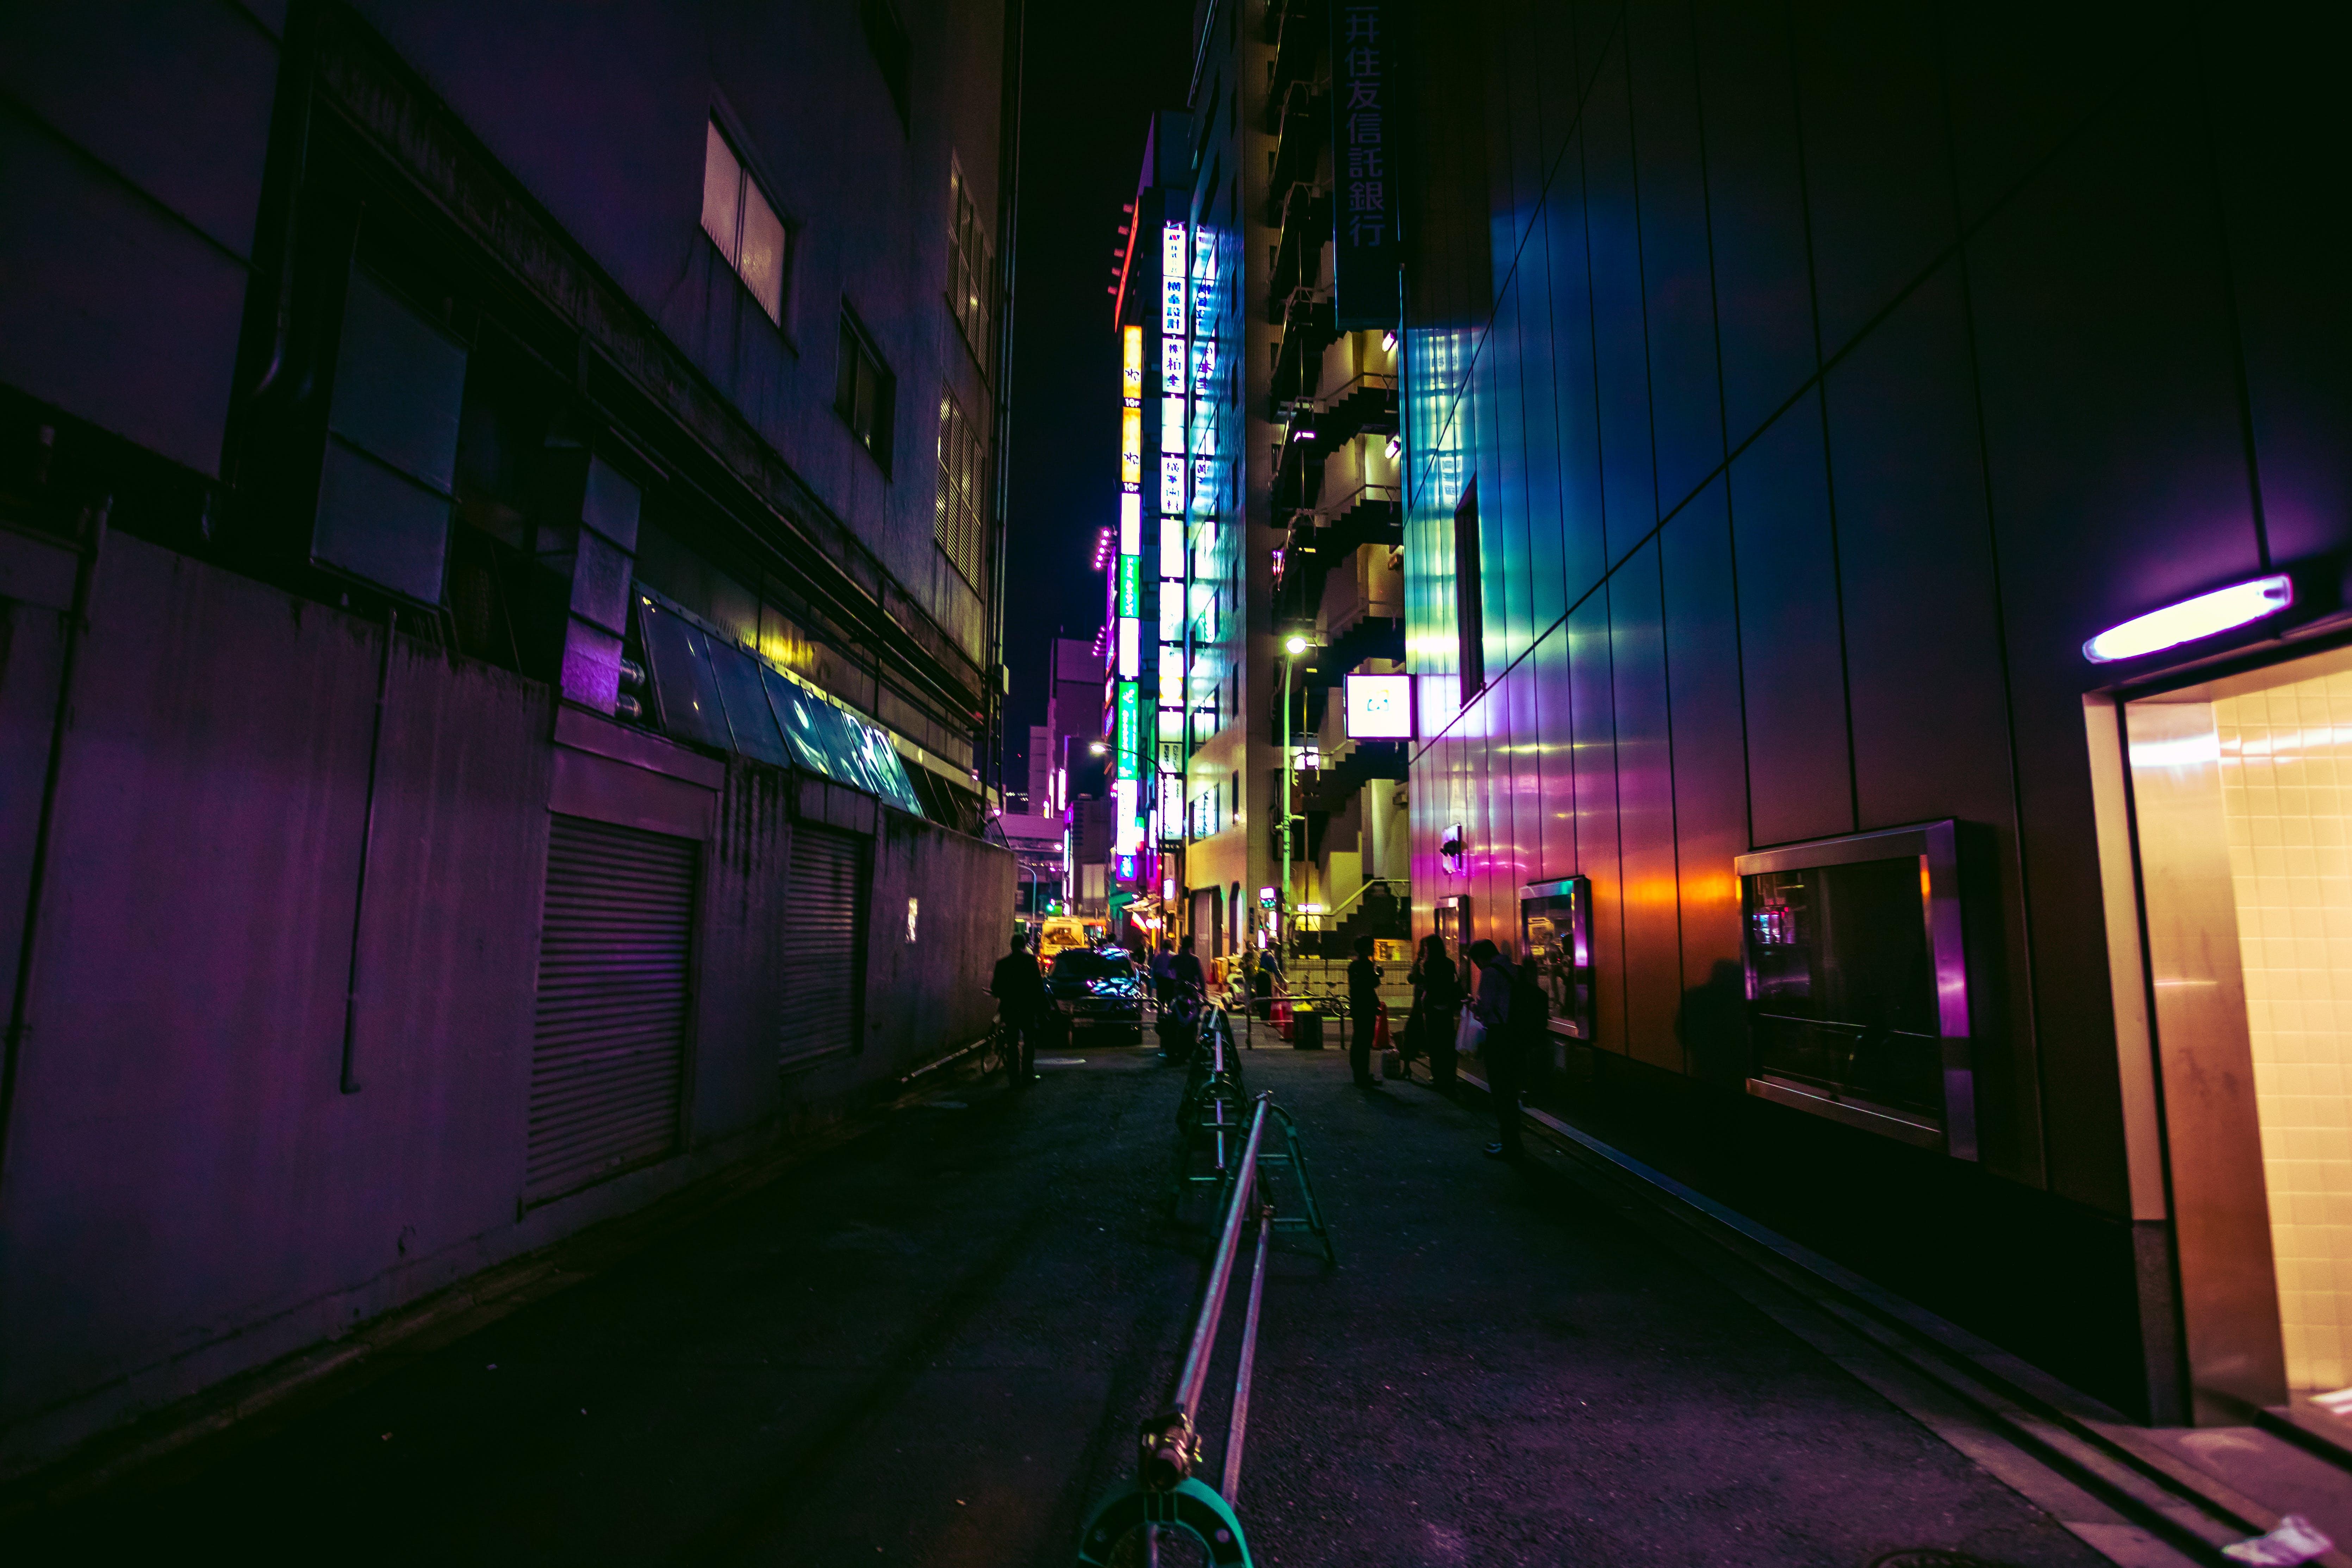 Photo of People Walking In Alley